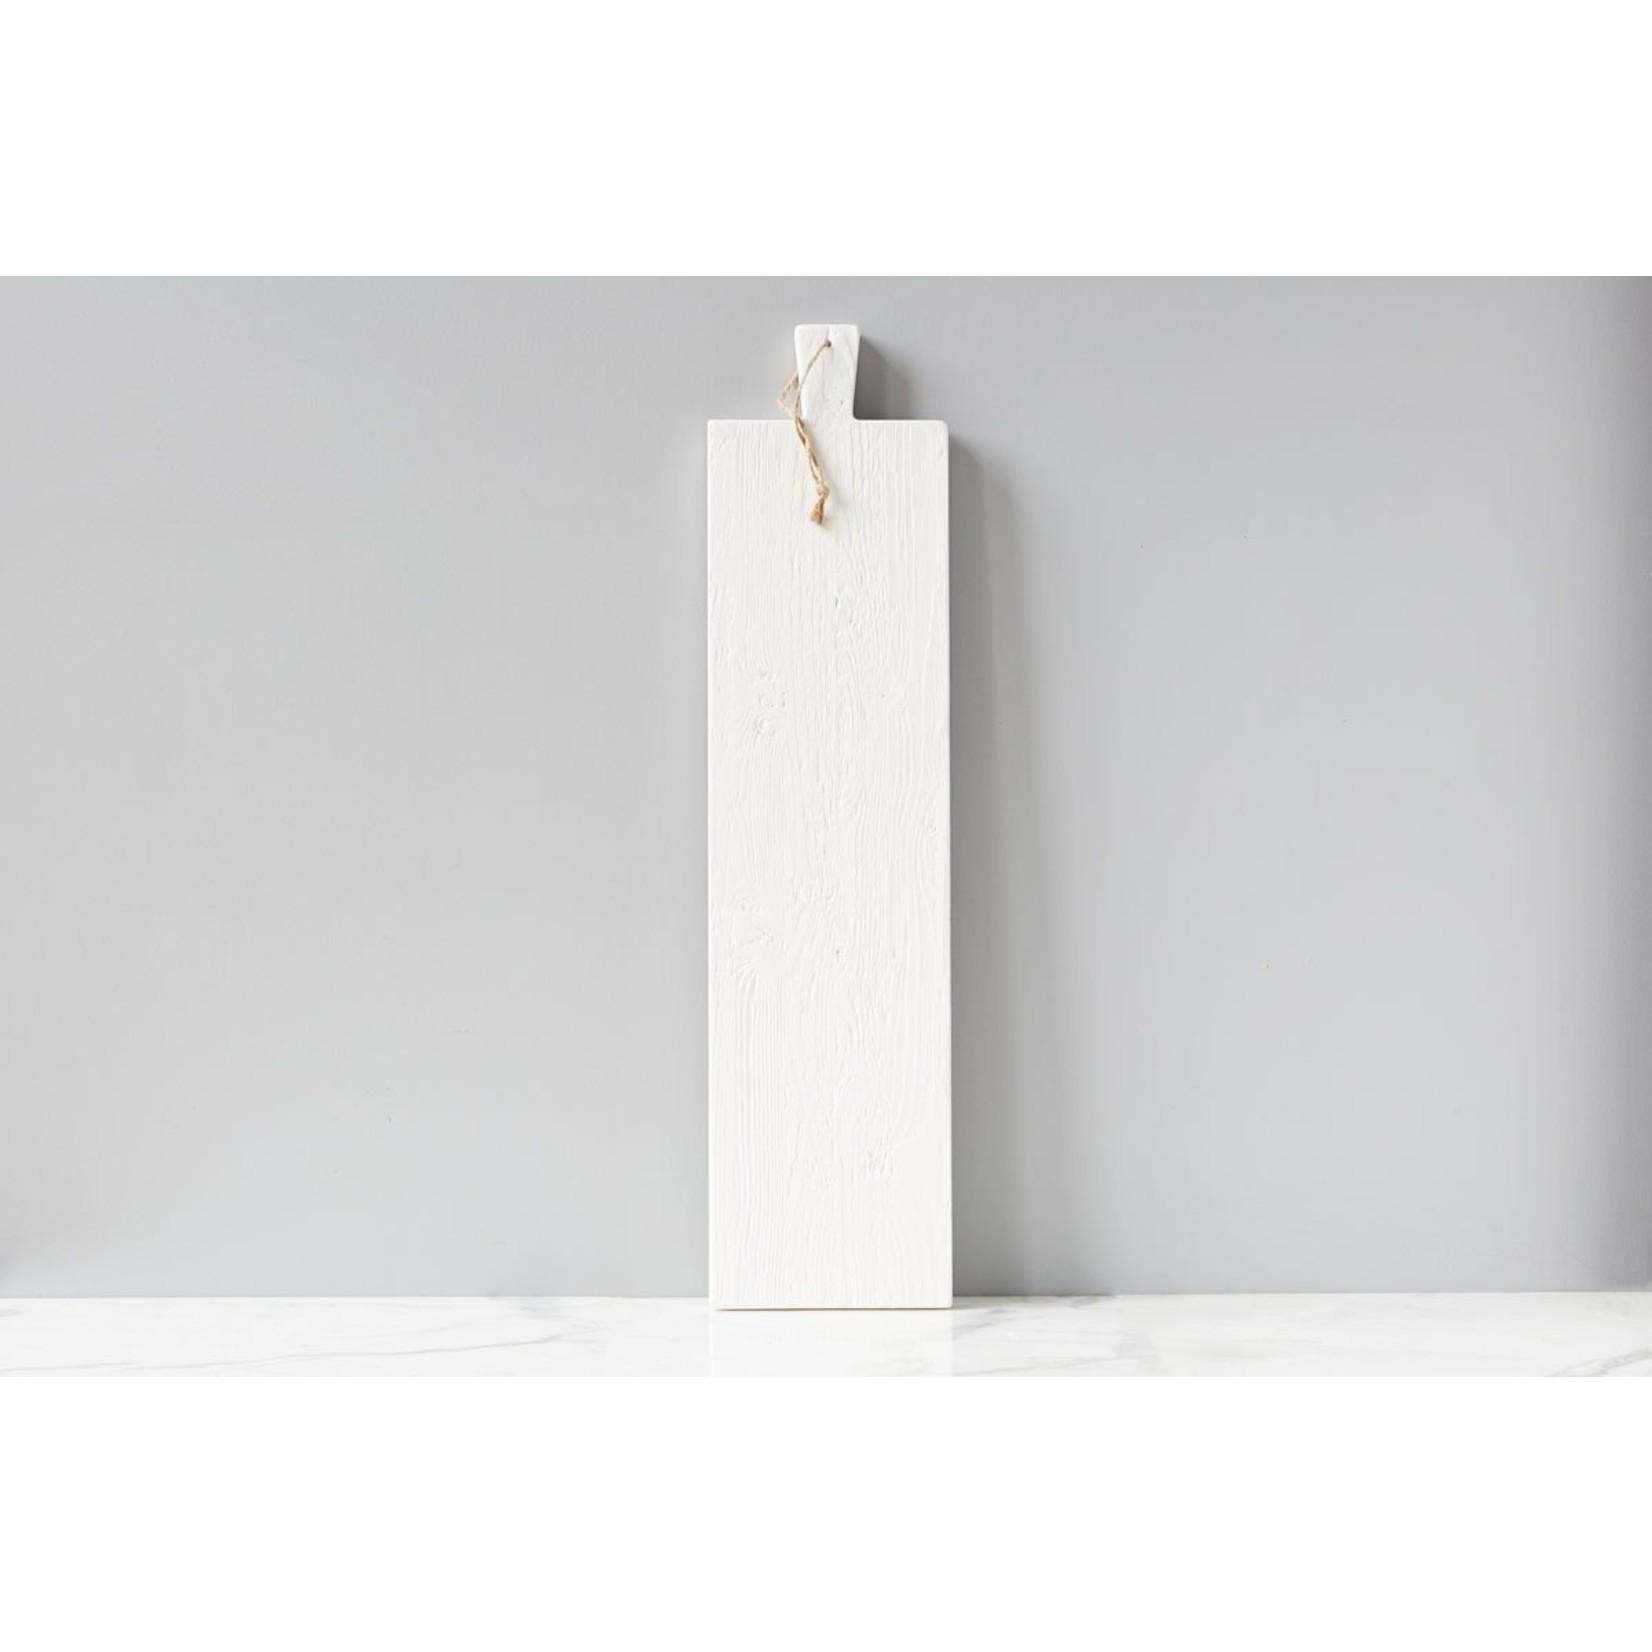 etu HOME Farmtable Plank in White